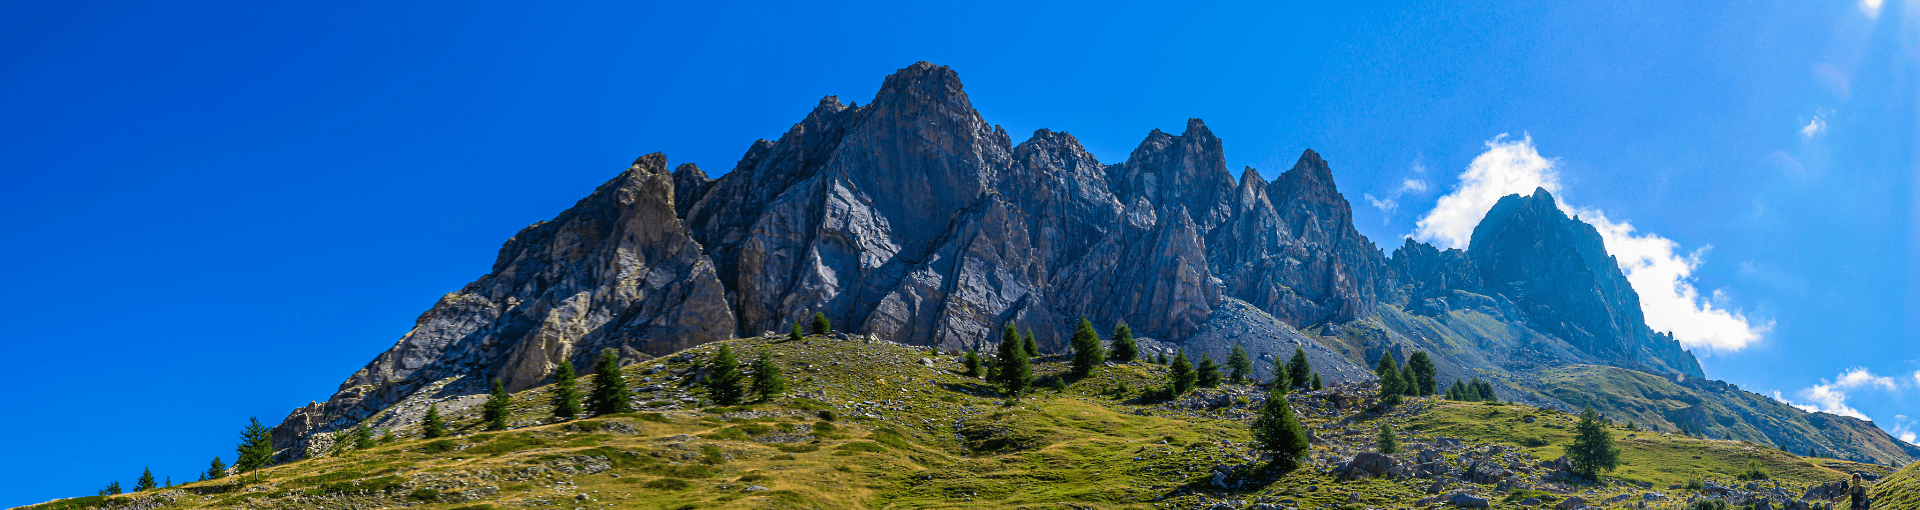 Cuneo valle maira